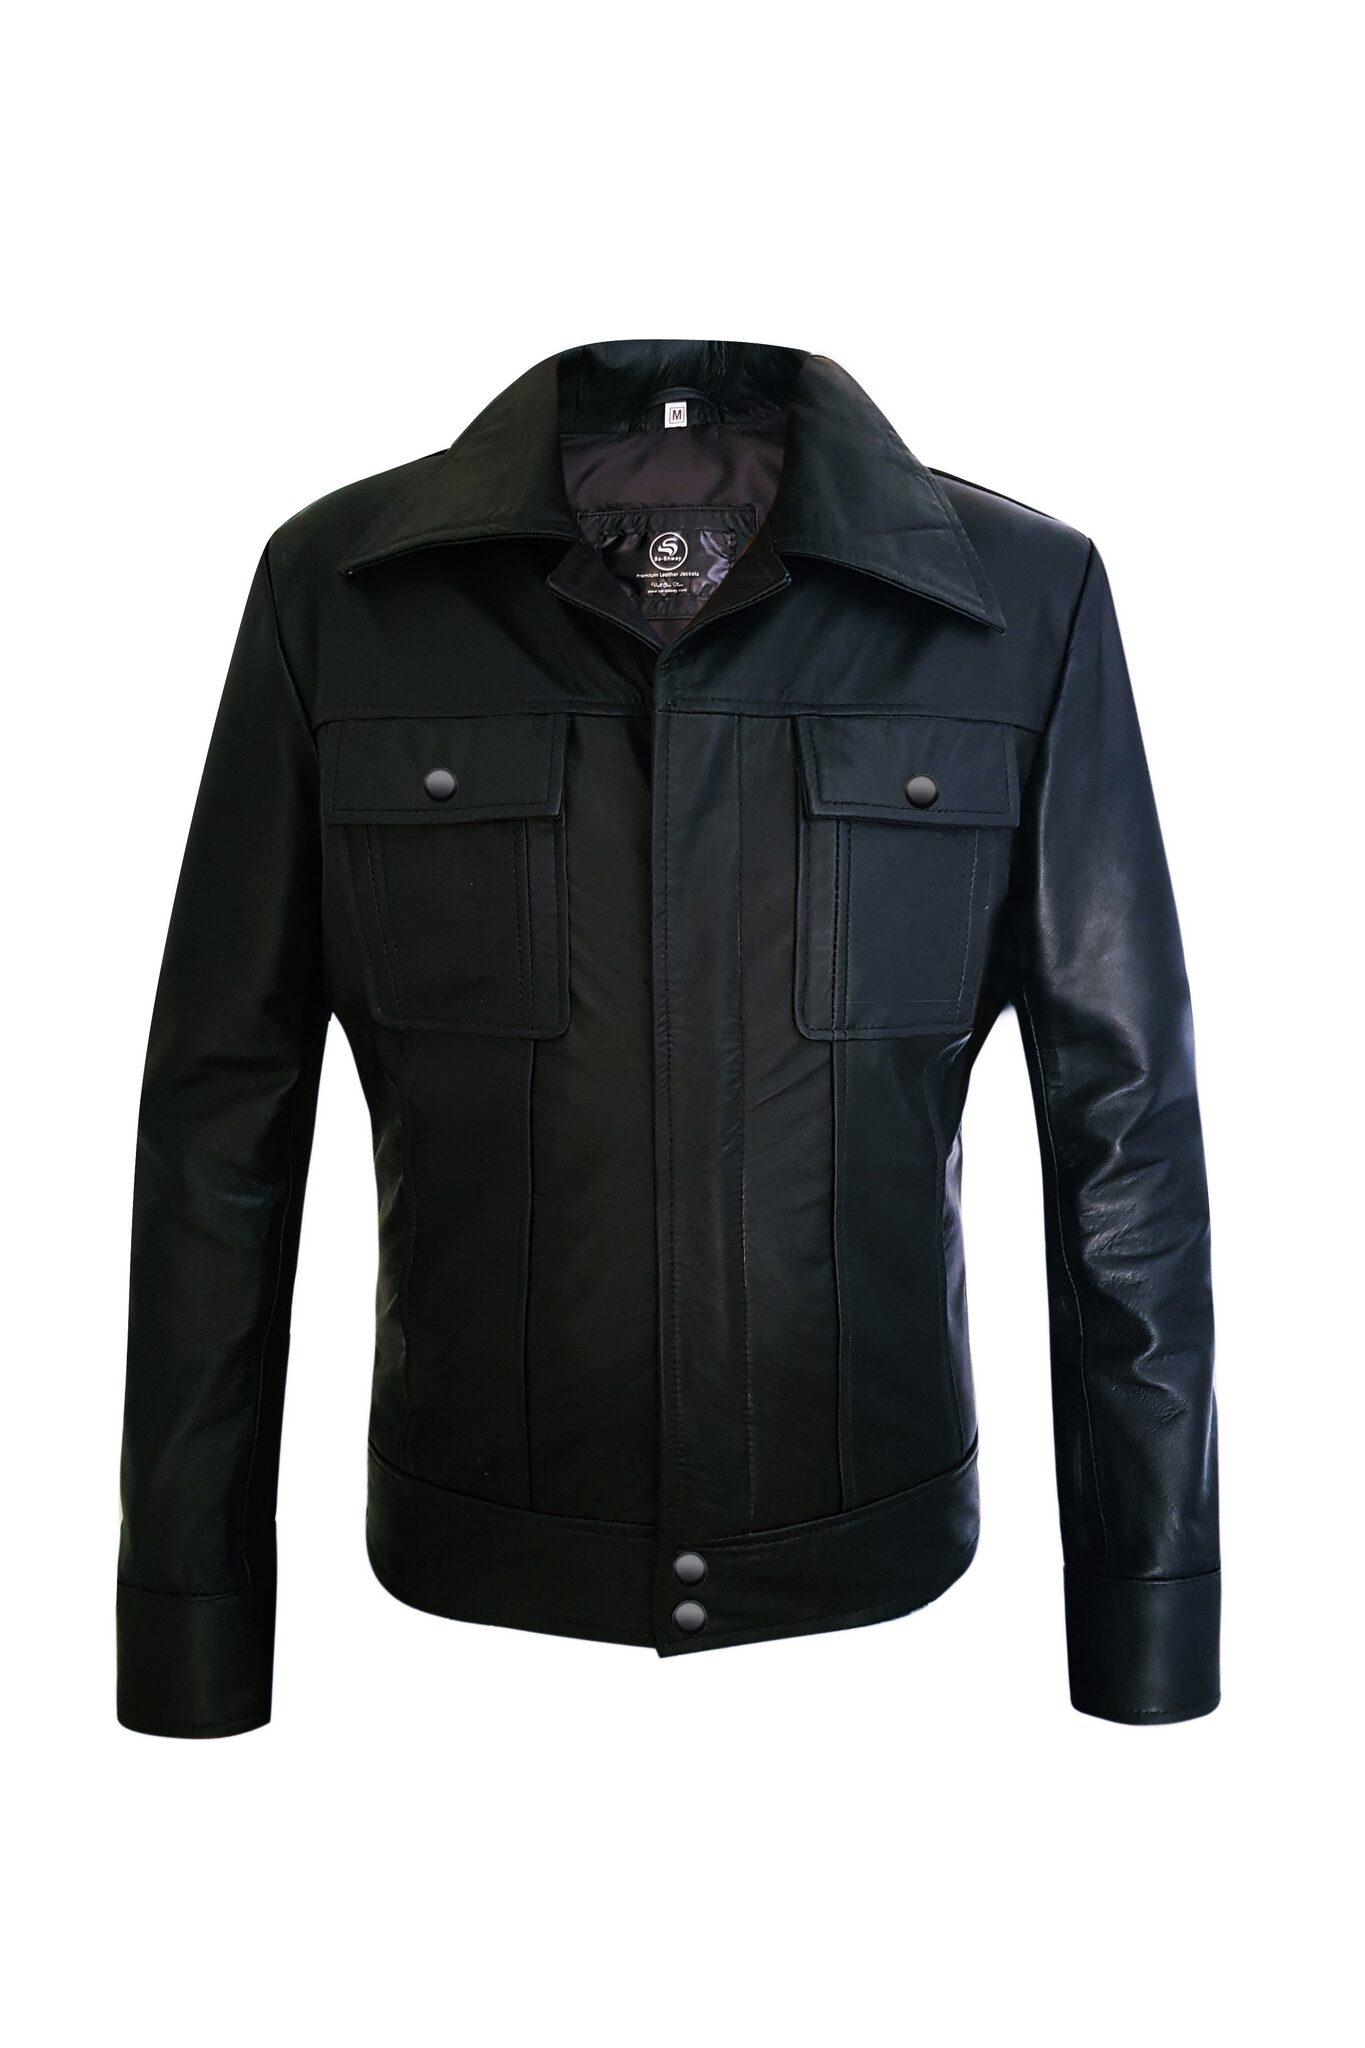 Two Pockets Mens Black Genuine Leather Jacket8